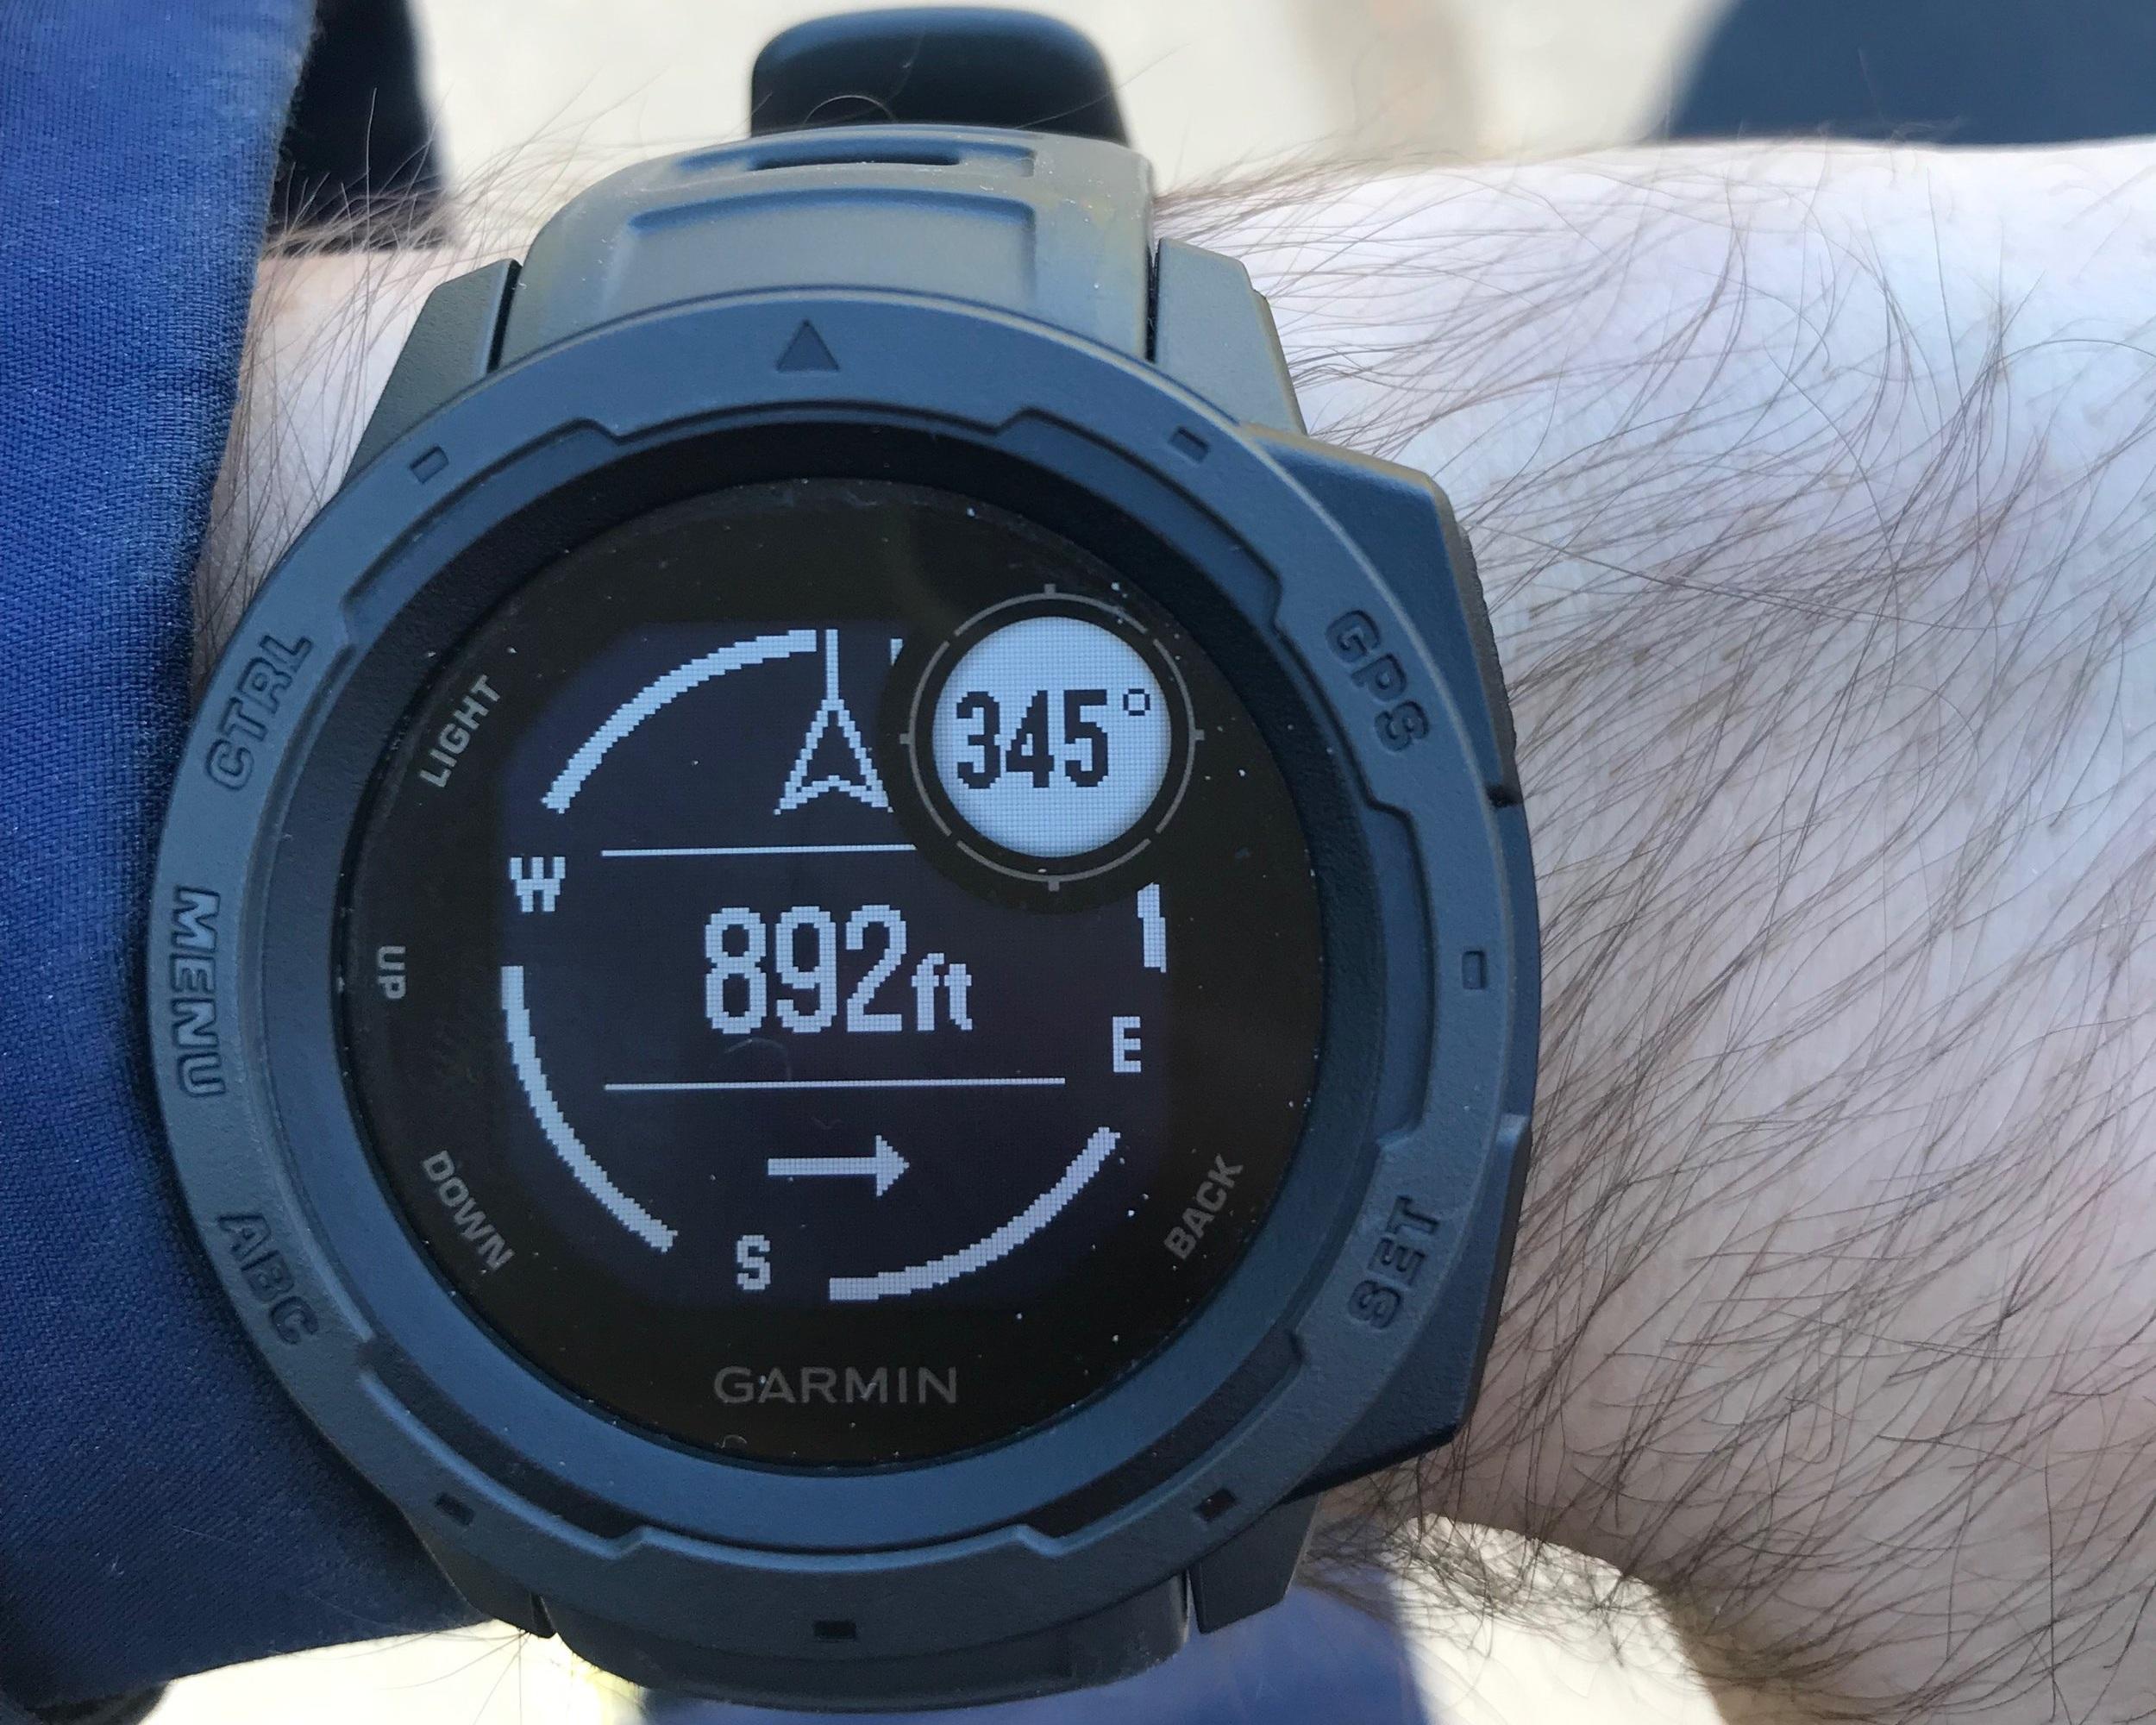 GPS Watch - Garmin Instinct GPS WatchRead why→